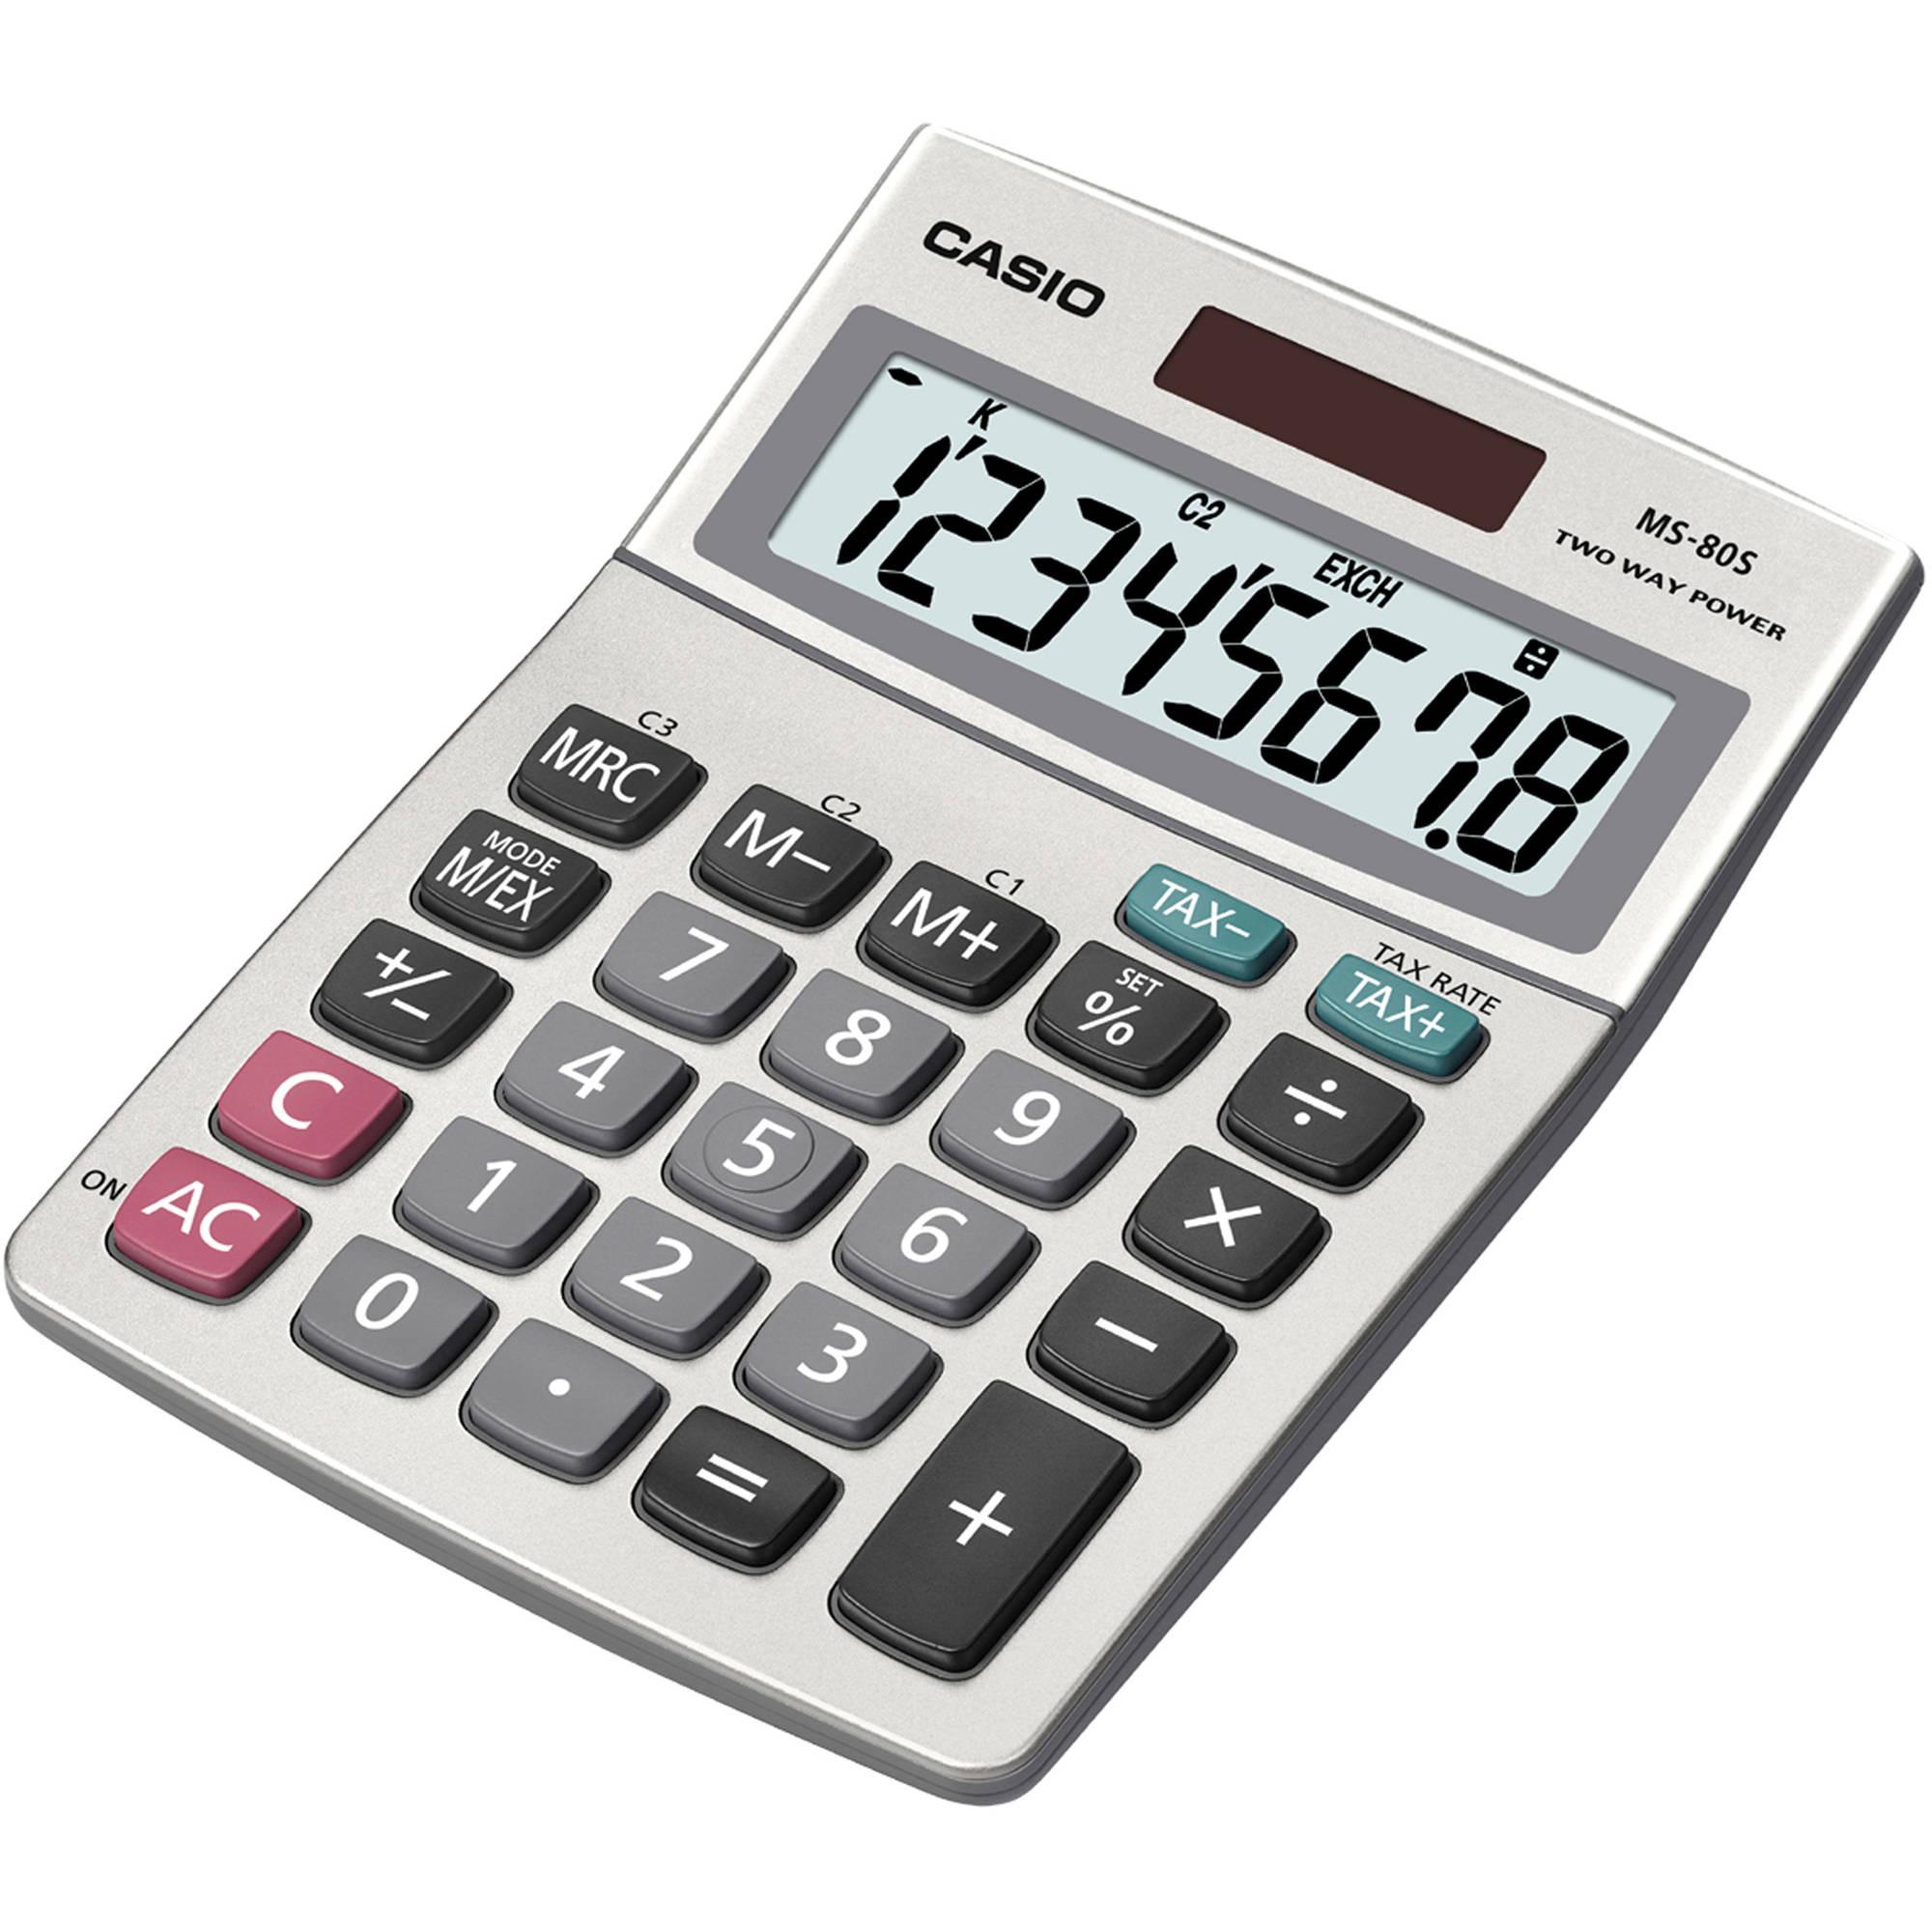 Medichest | Casio MS-80S 8-Digit Desktop Calculator